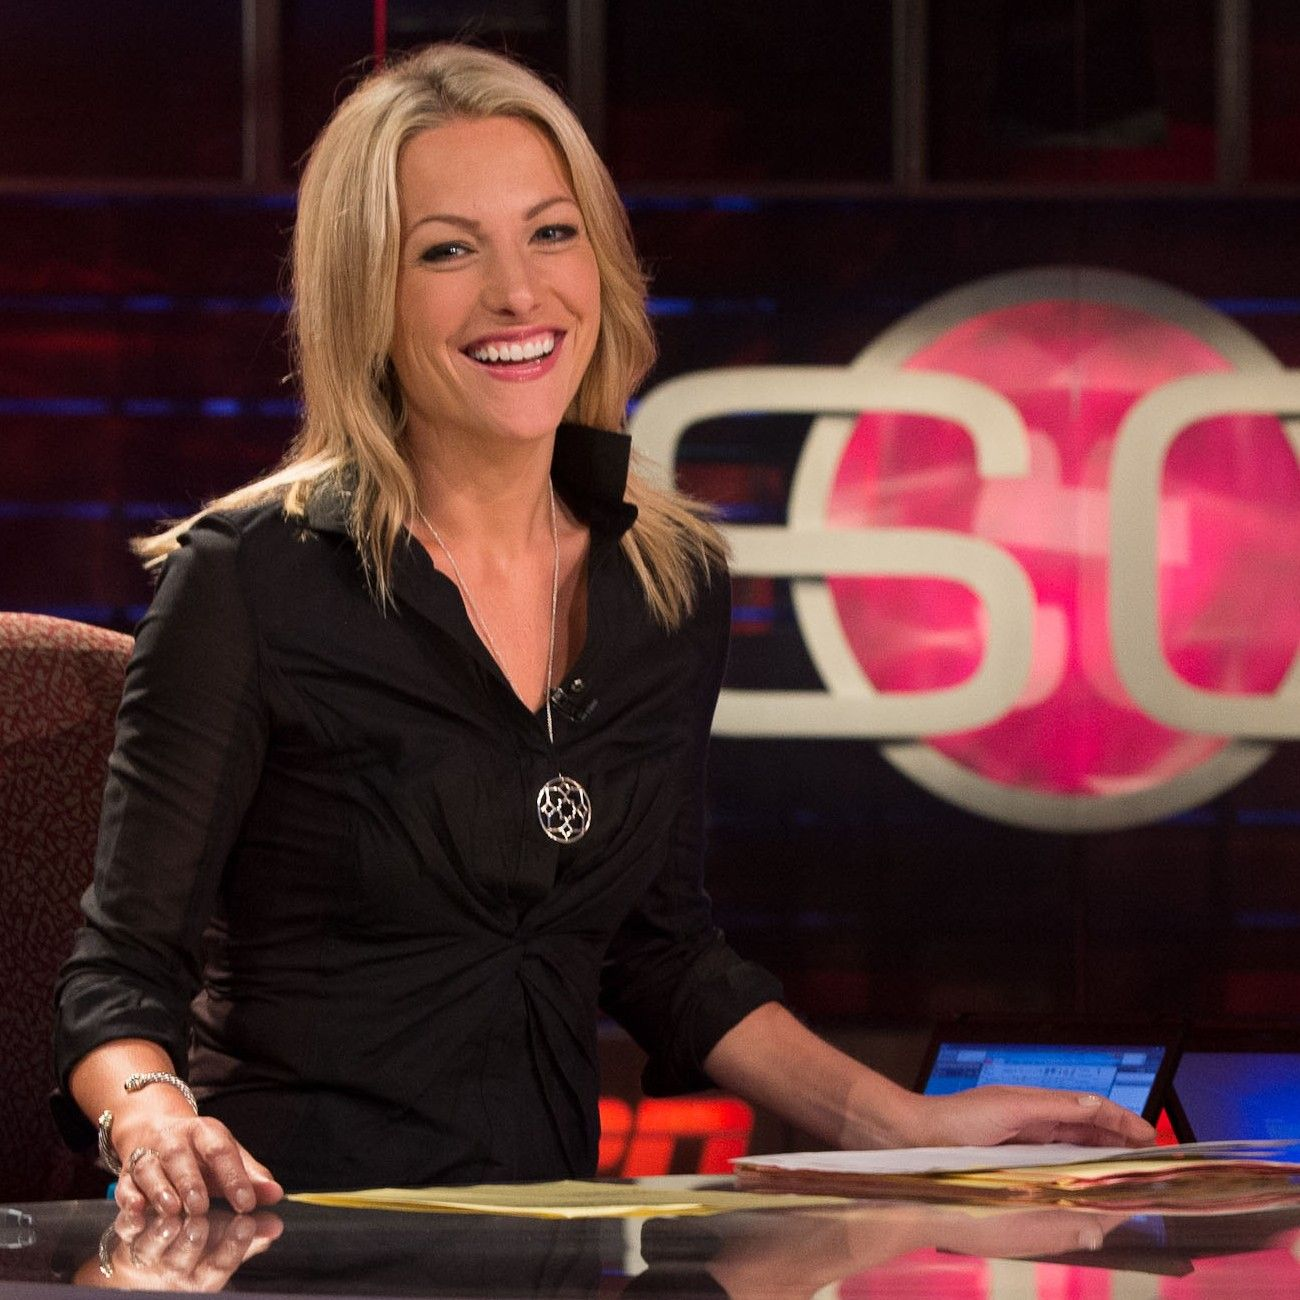 Lindsay Ann Czarniak (born November 7, 1977) is a sports